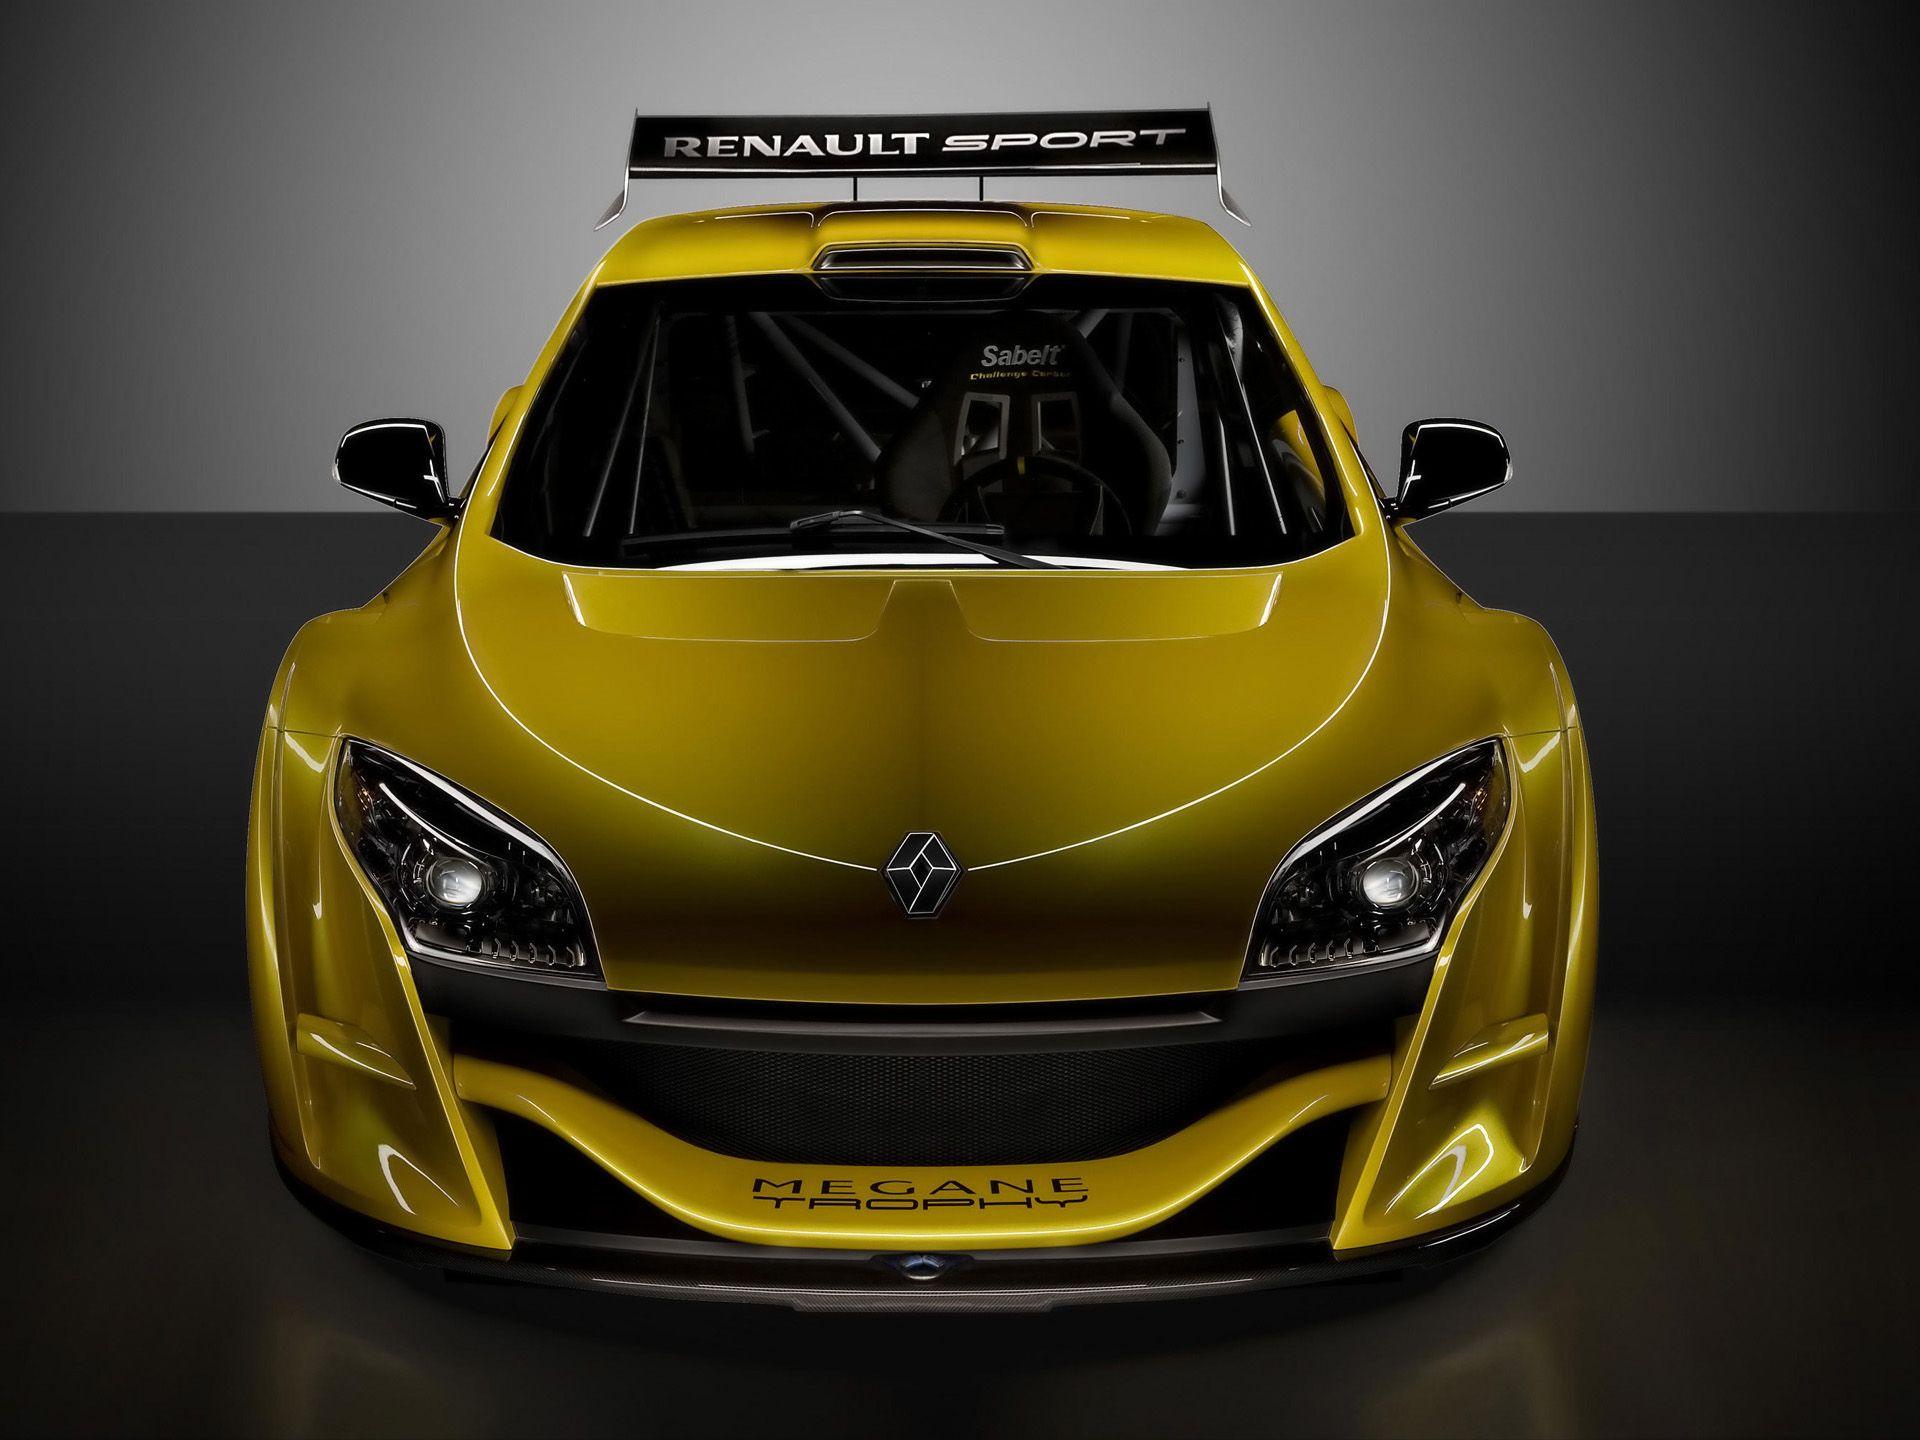 Renault Megane Rs Trophy Renault Megane Renault